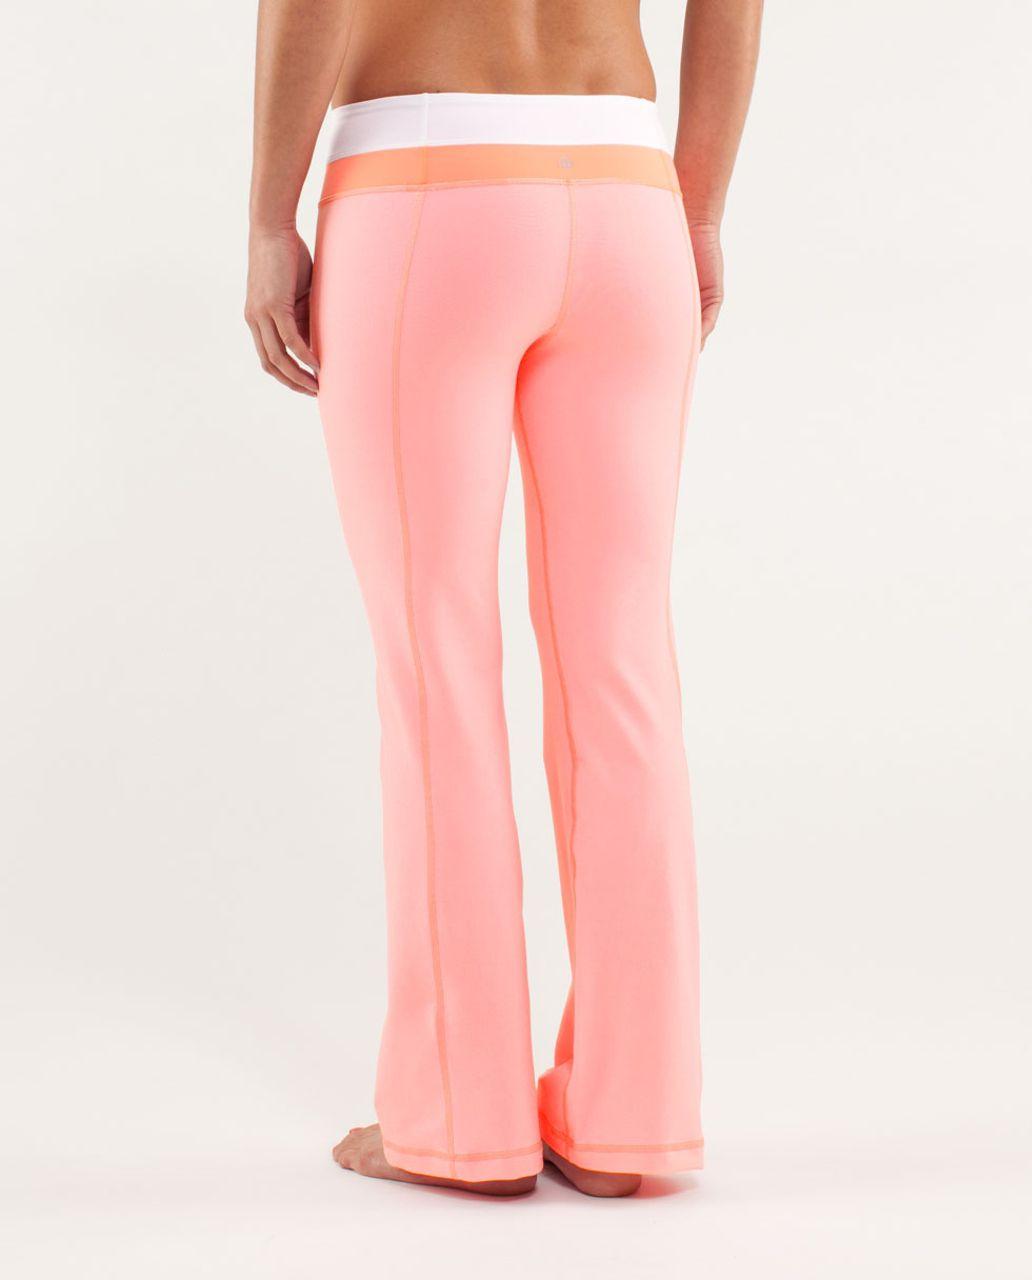 Lululemon Groove Pant *New (Regular) - Bleached Coral / White / Pop Orange